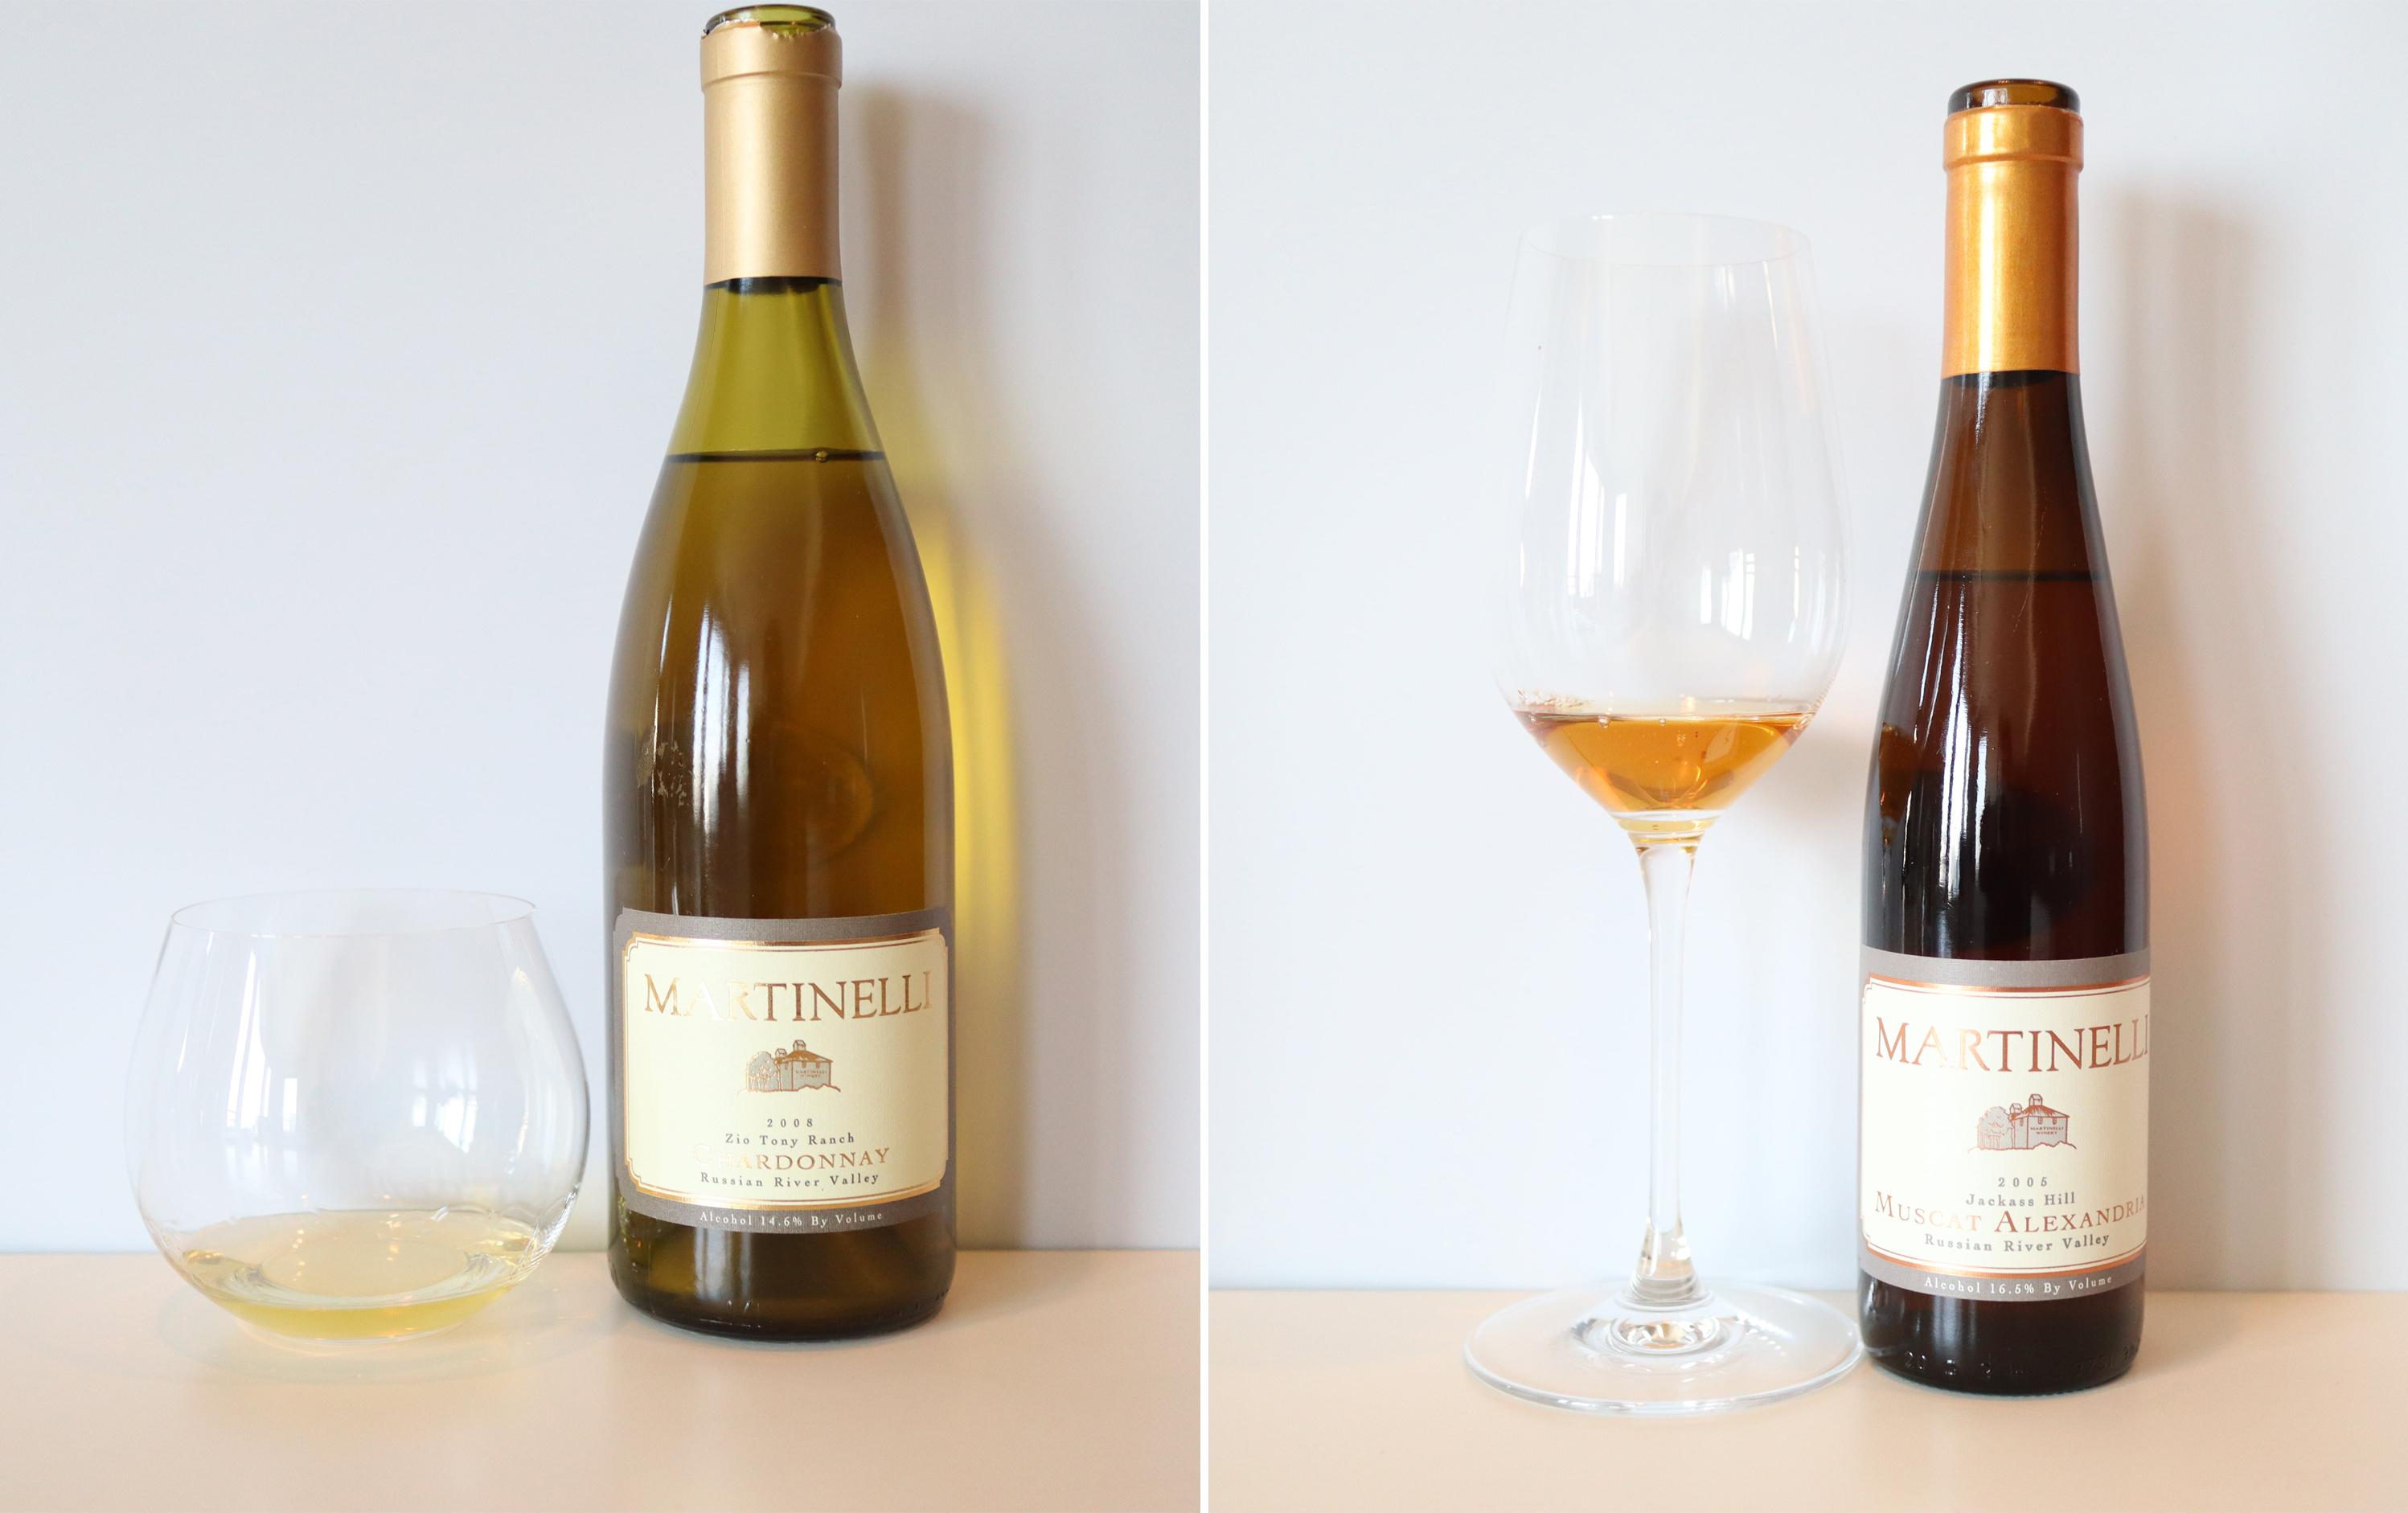 Martinelli Chardonnay Zio Tony Ranch 2008 , Martinelli Muscat Alexandria Jackass Hill 2005